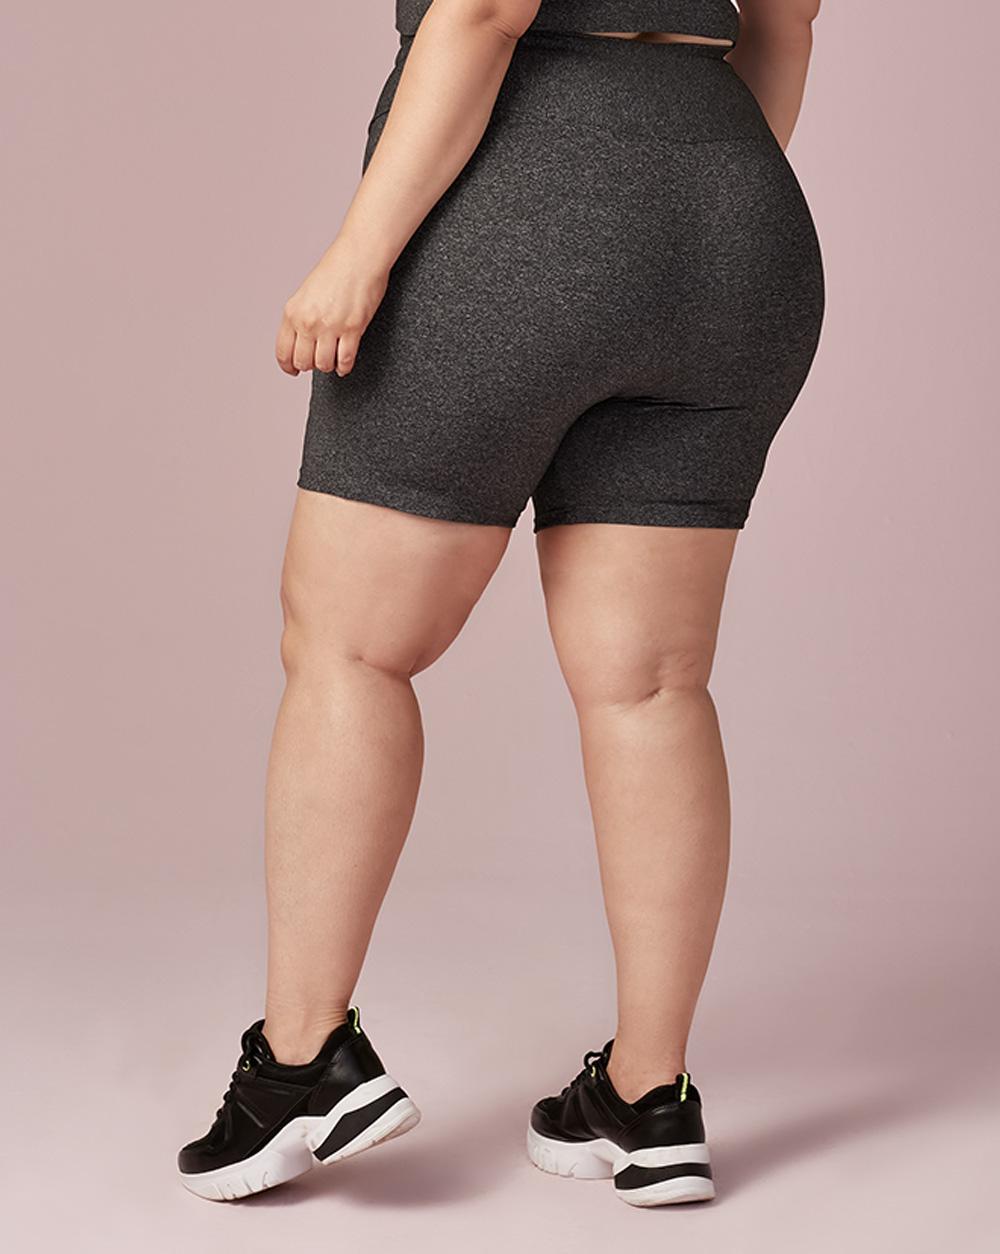 Shorts Meia Coxa - Dukley Lingerie - Plus - 606